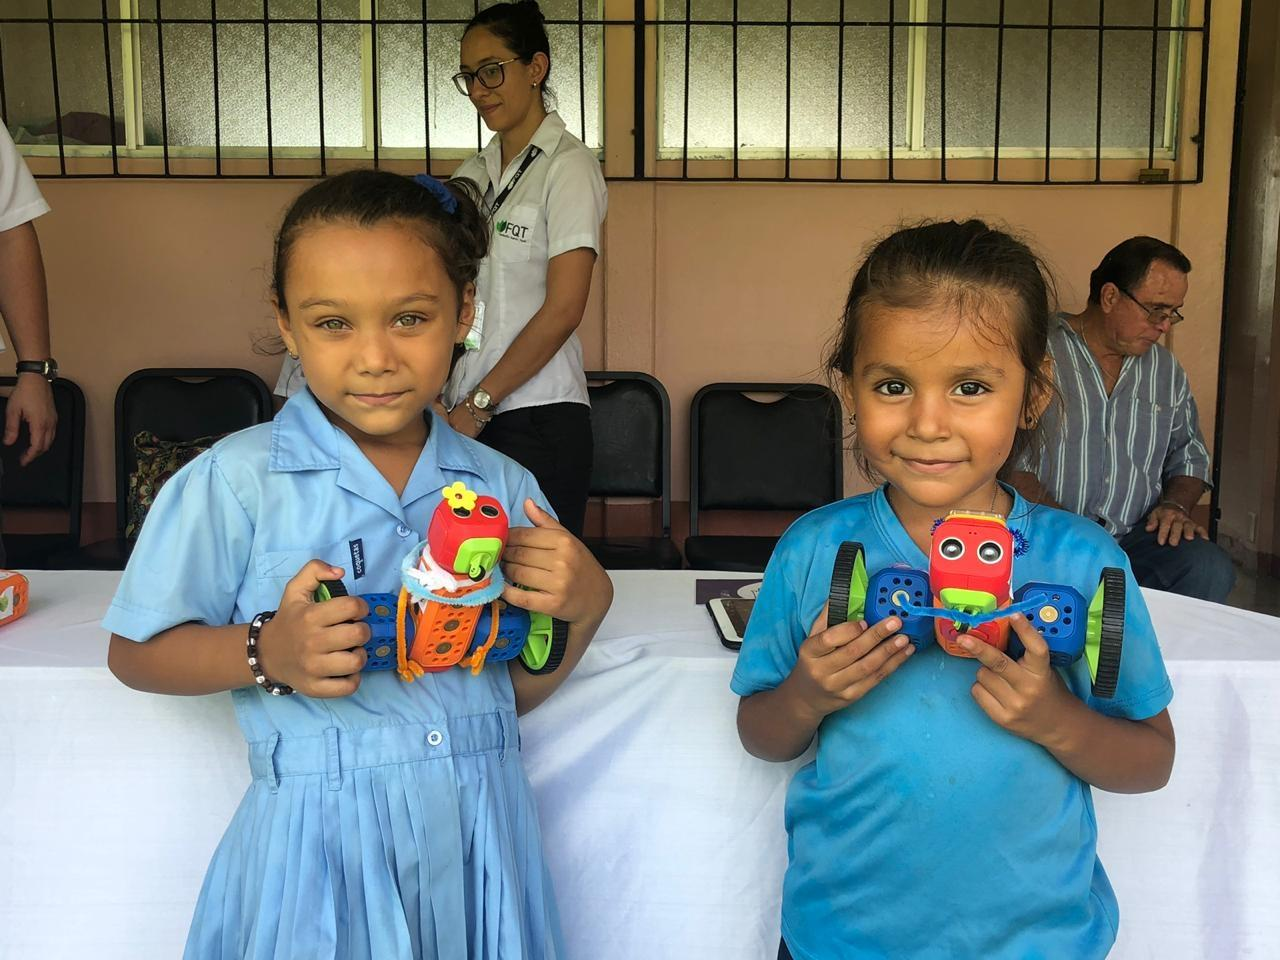 Empower Costa Rican girls in technology & robotics